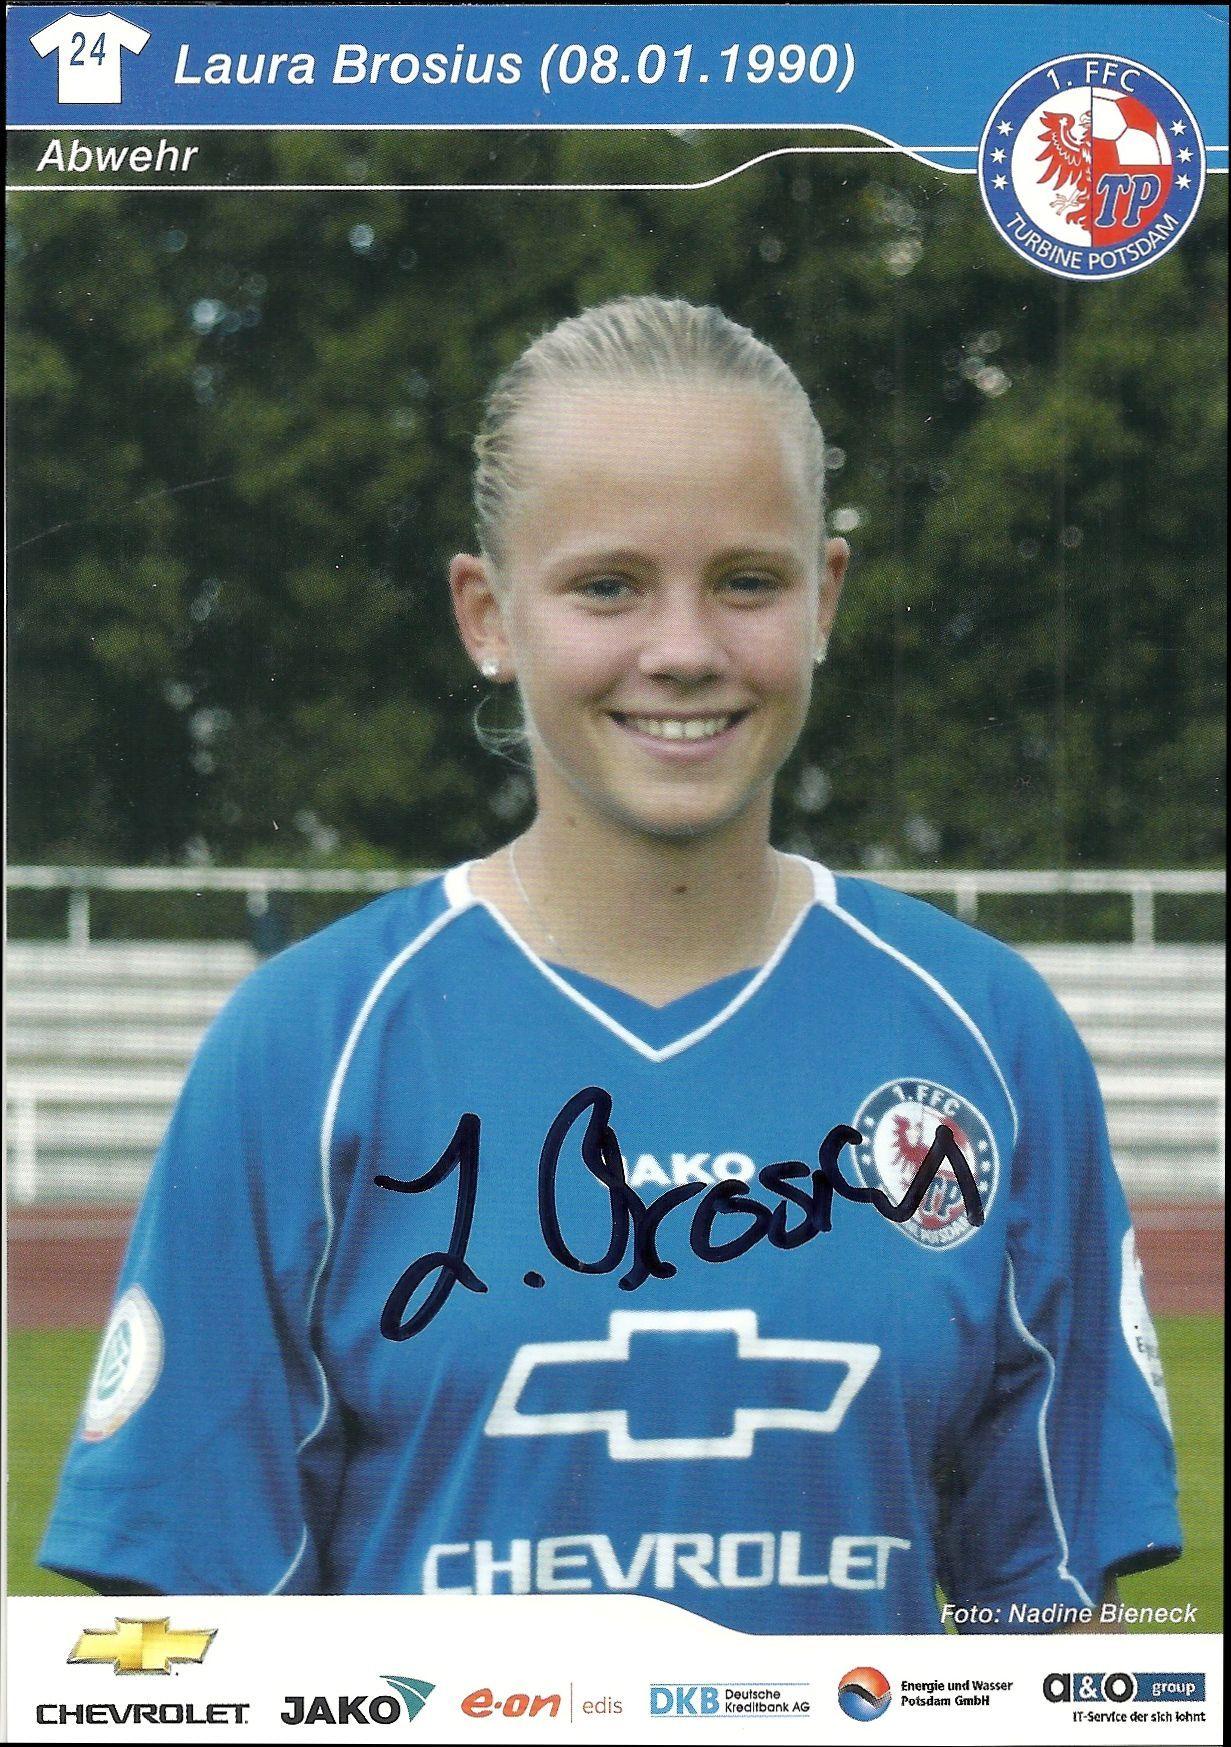 2006 07 Fcc Turbine Potsdam Laura Brosius Autograph Football